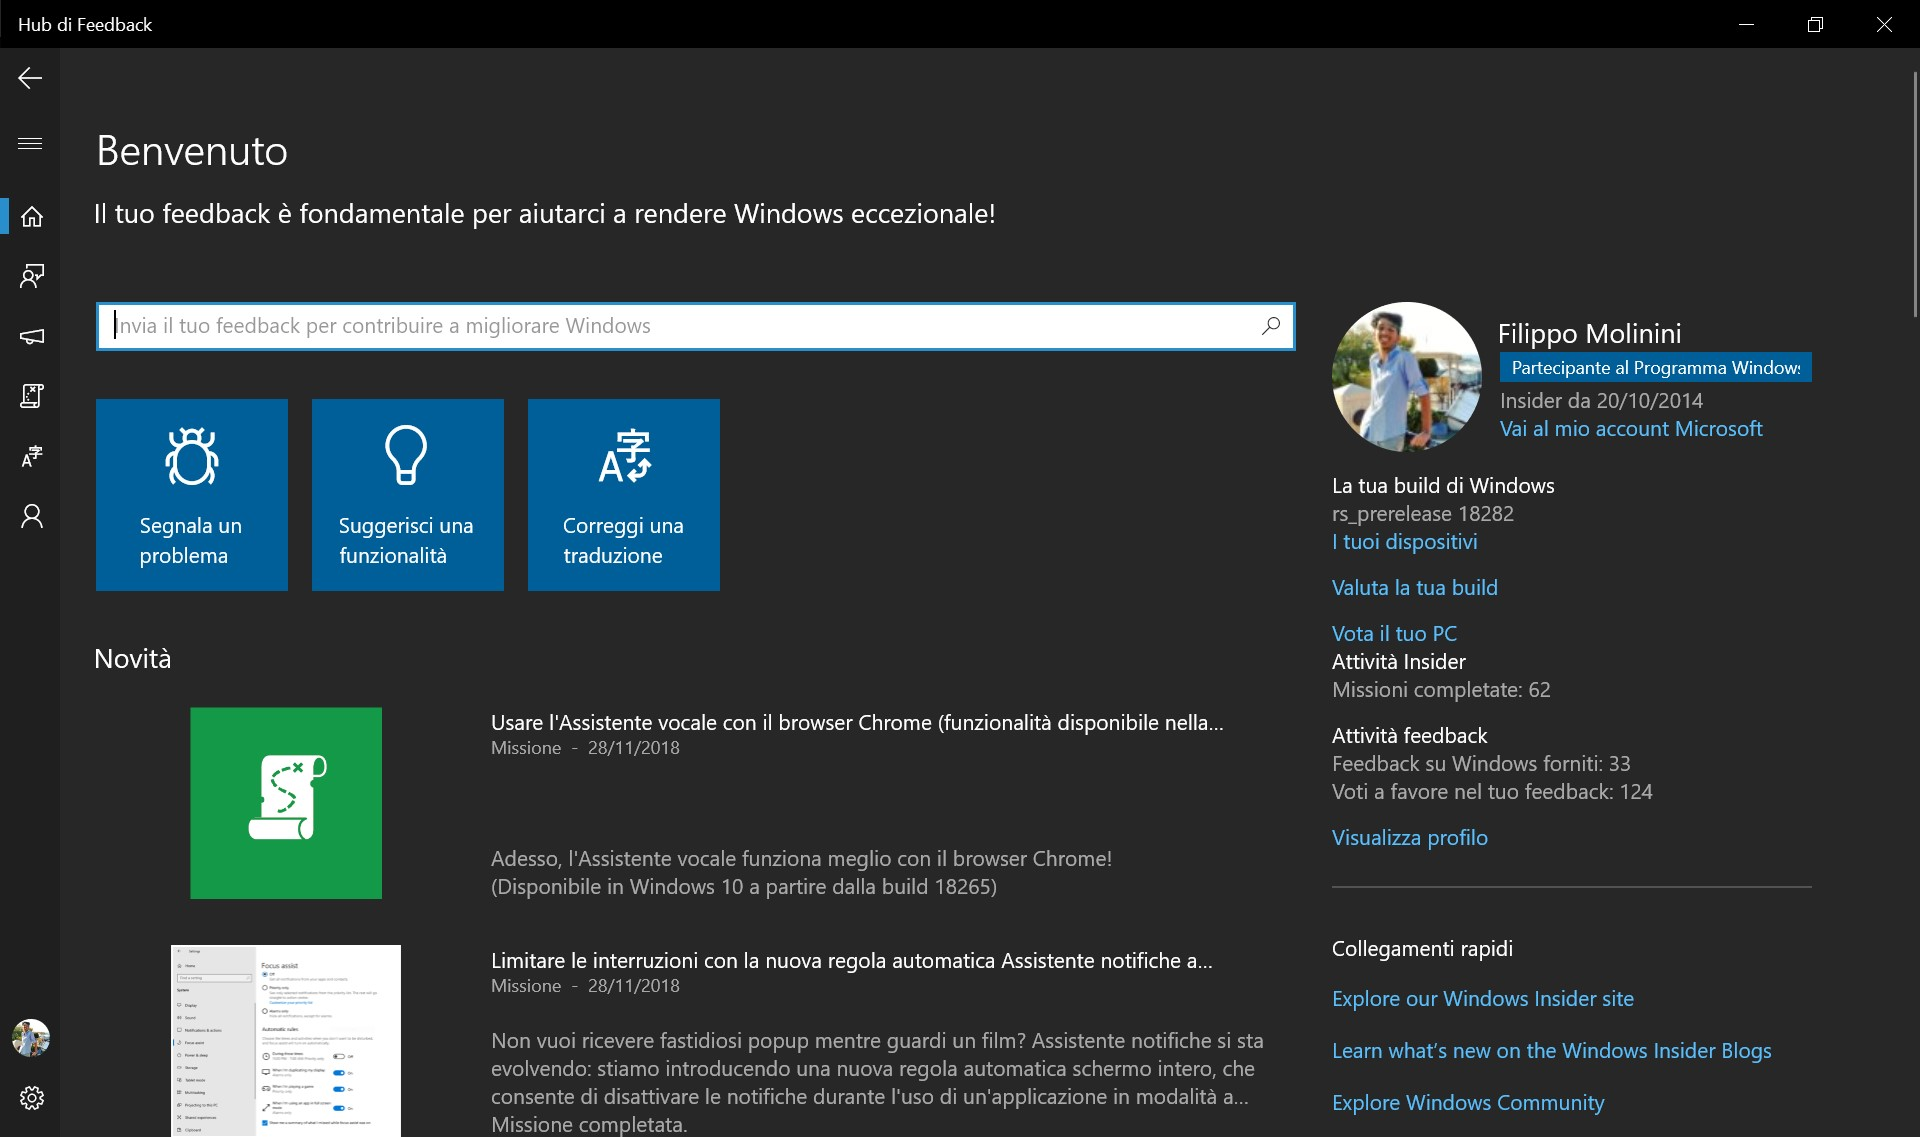 Hub di Feedback nuovo design tema scuro Windows 10